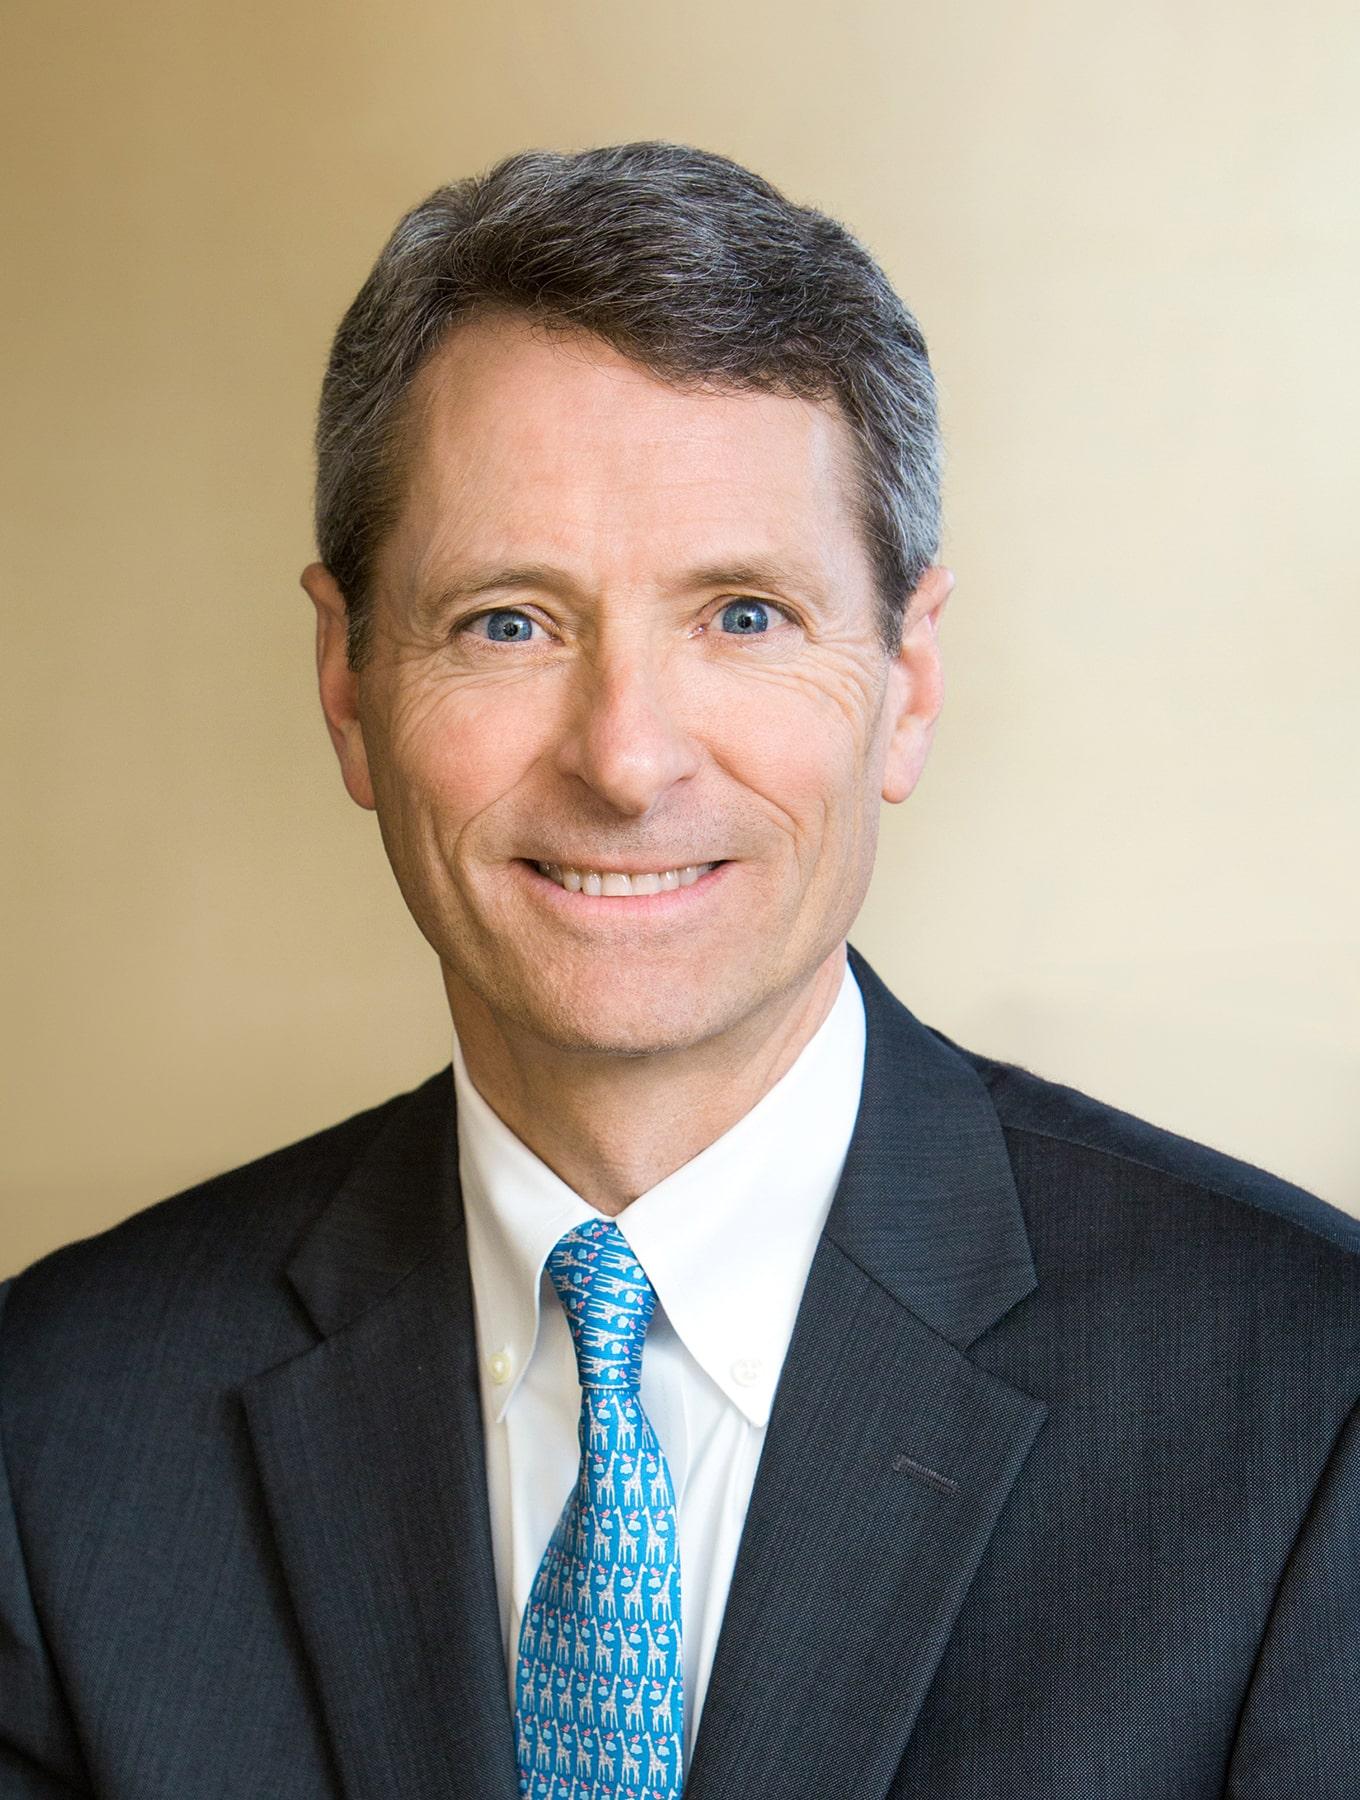 Christopher D. Brown, CFA